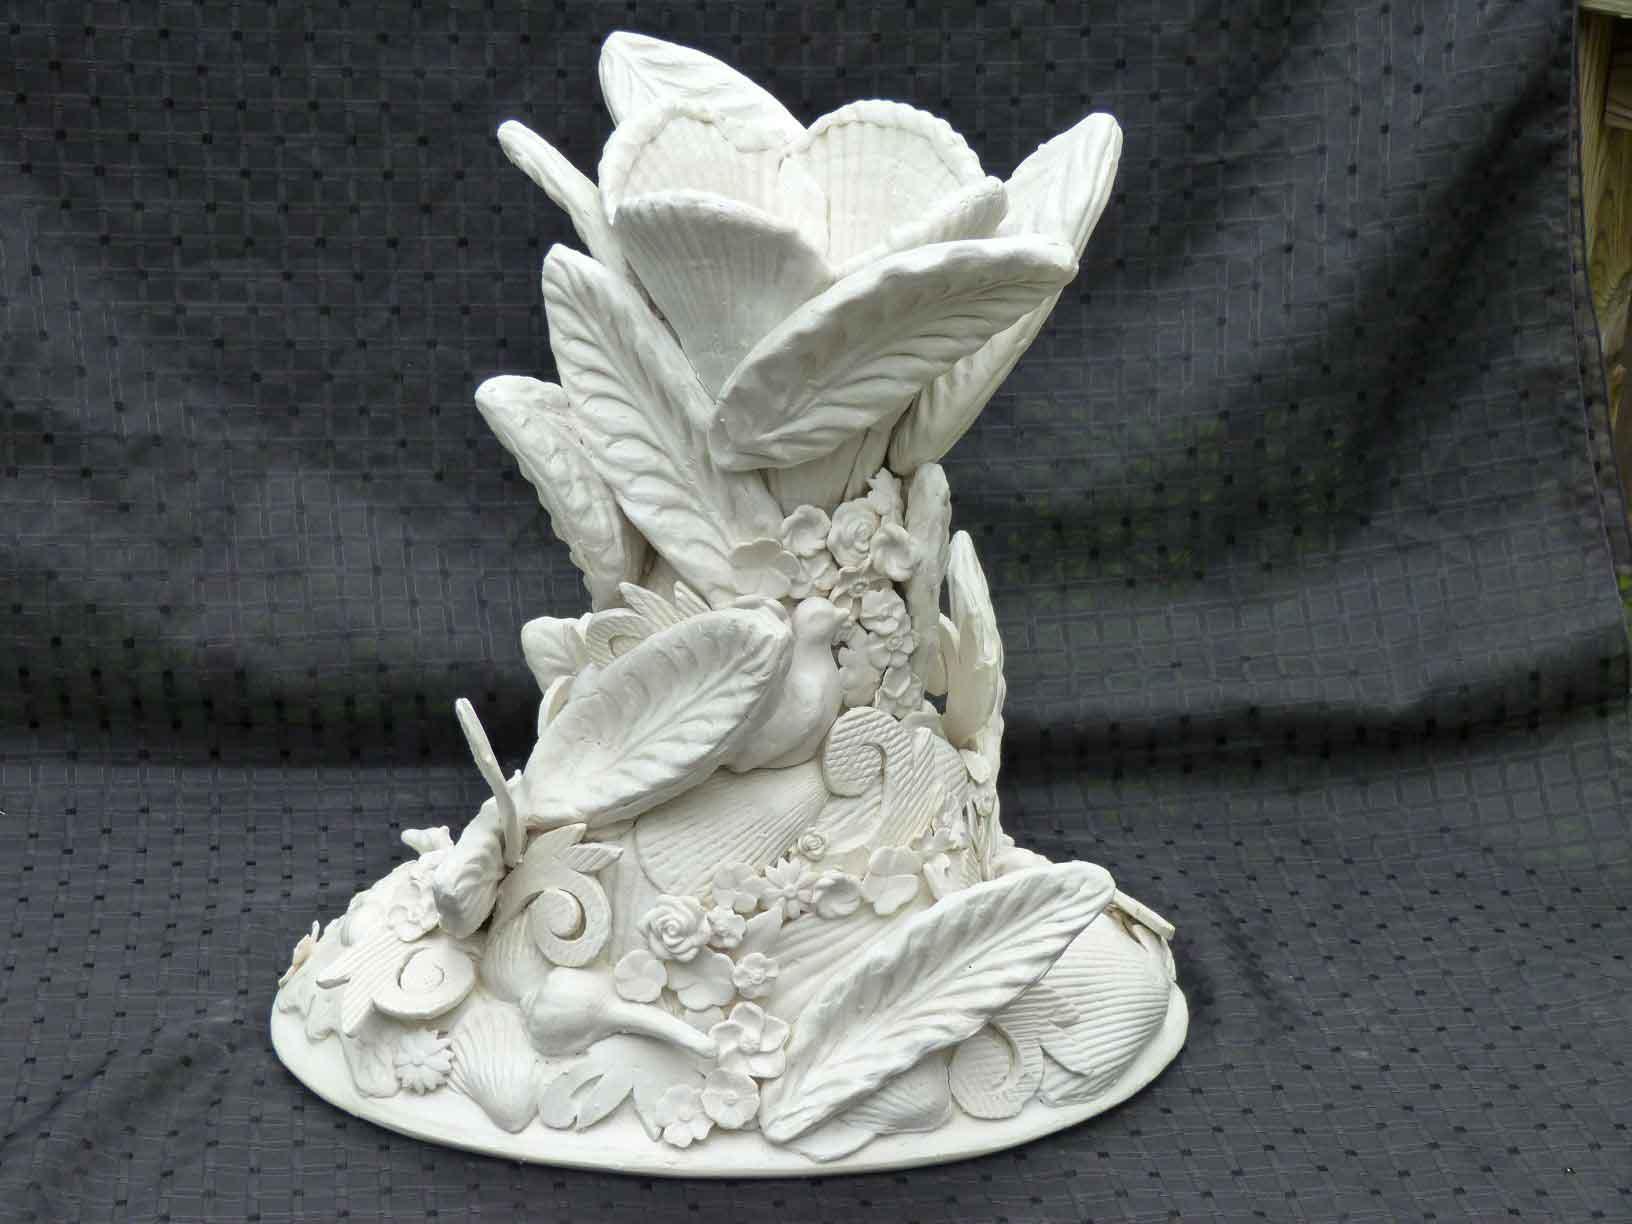 Porcelain sculpture by Ann Cummings